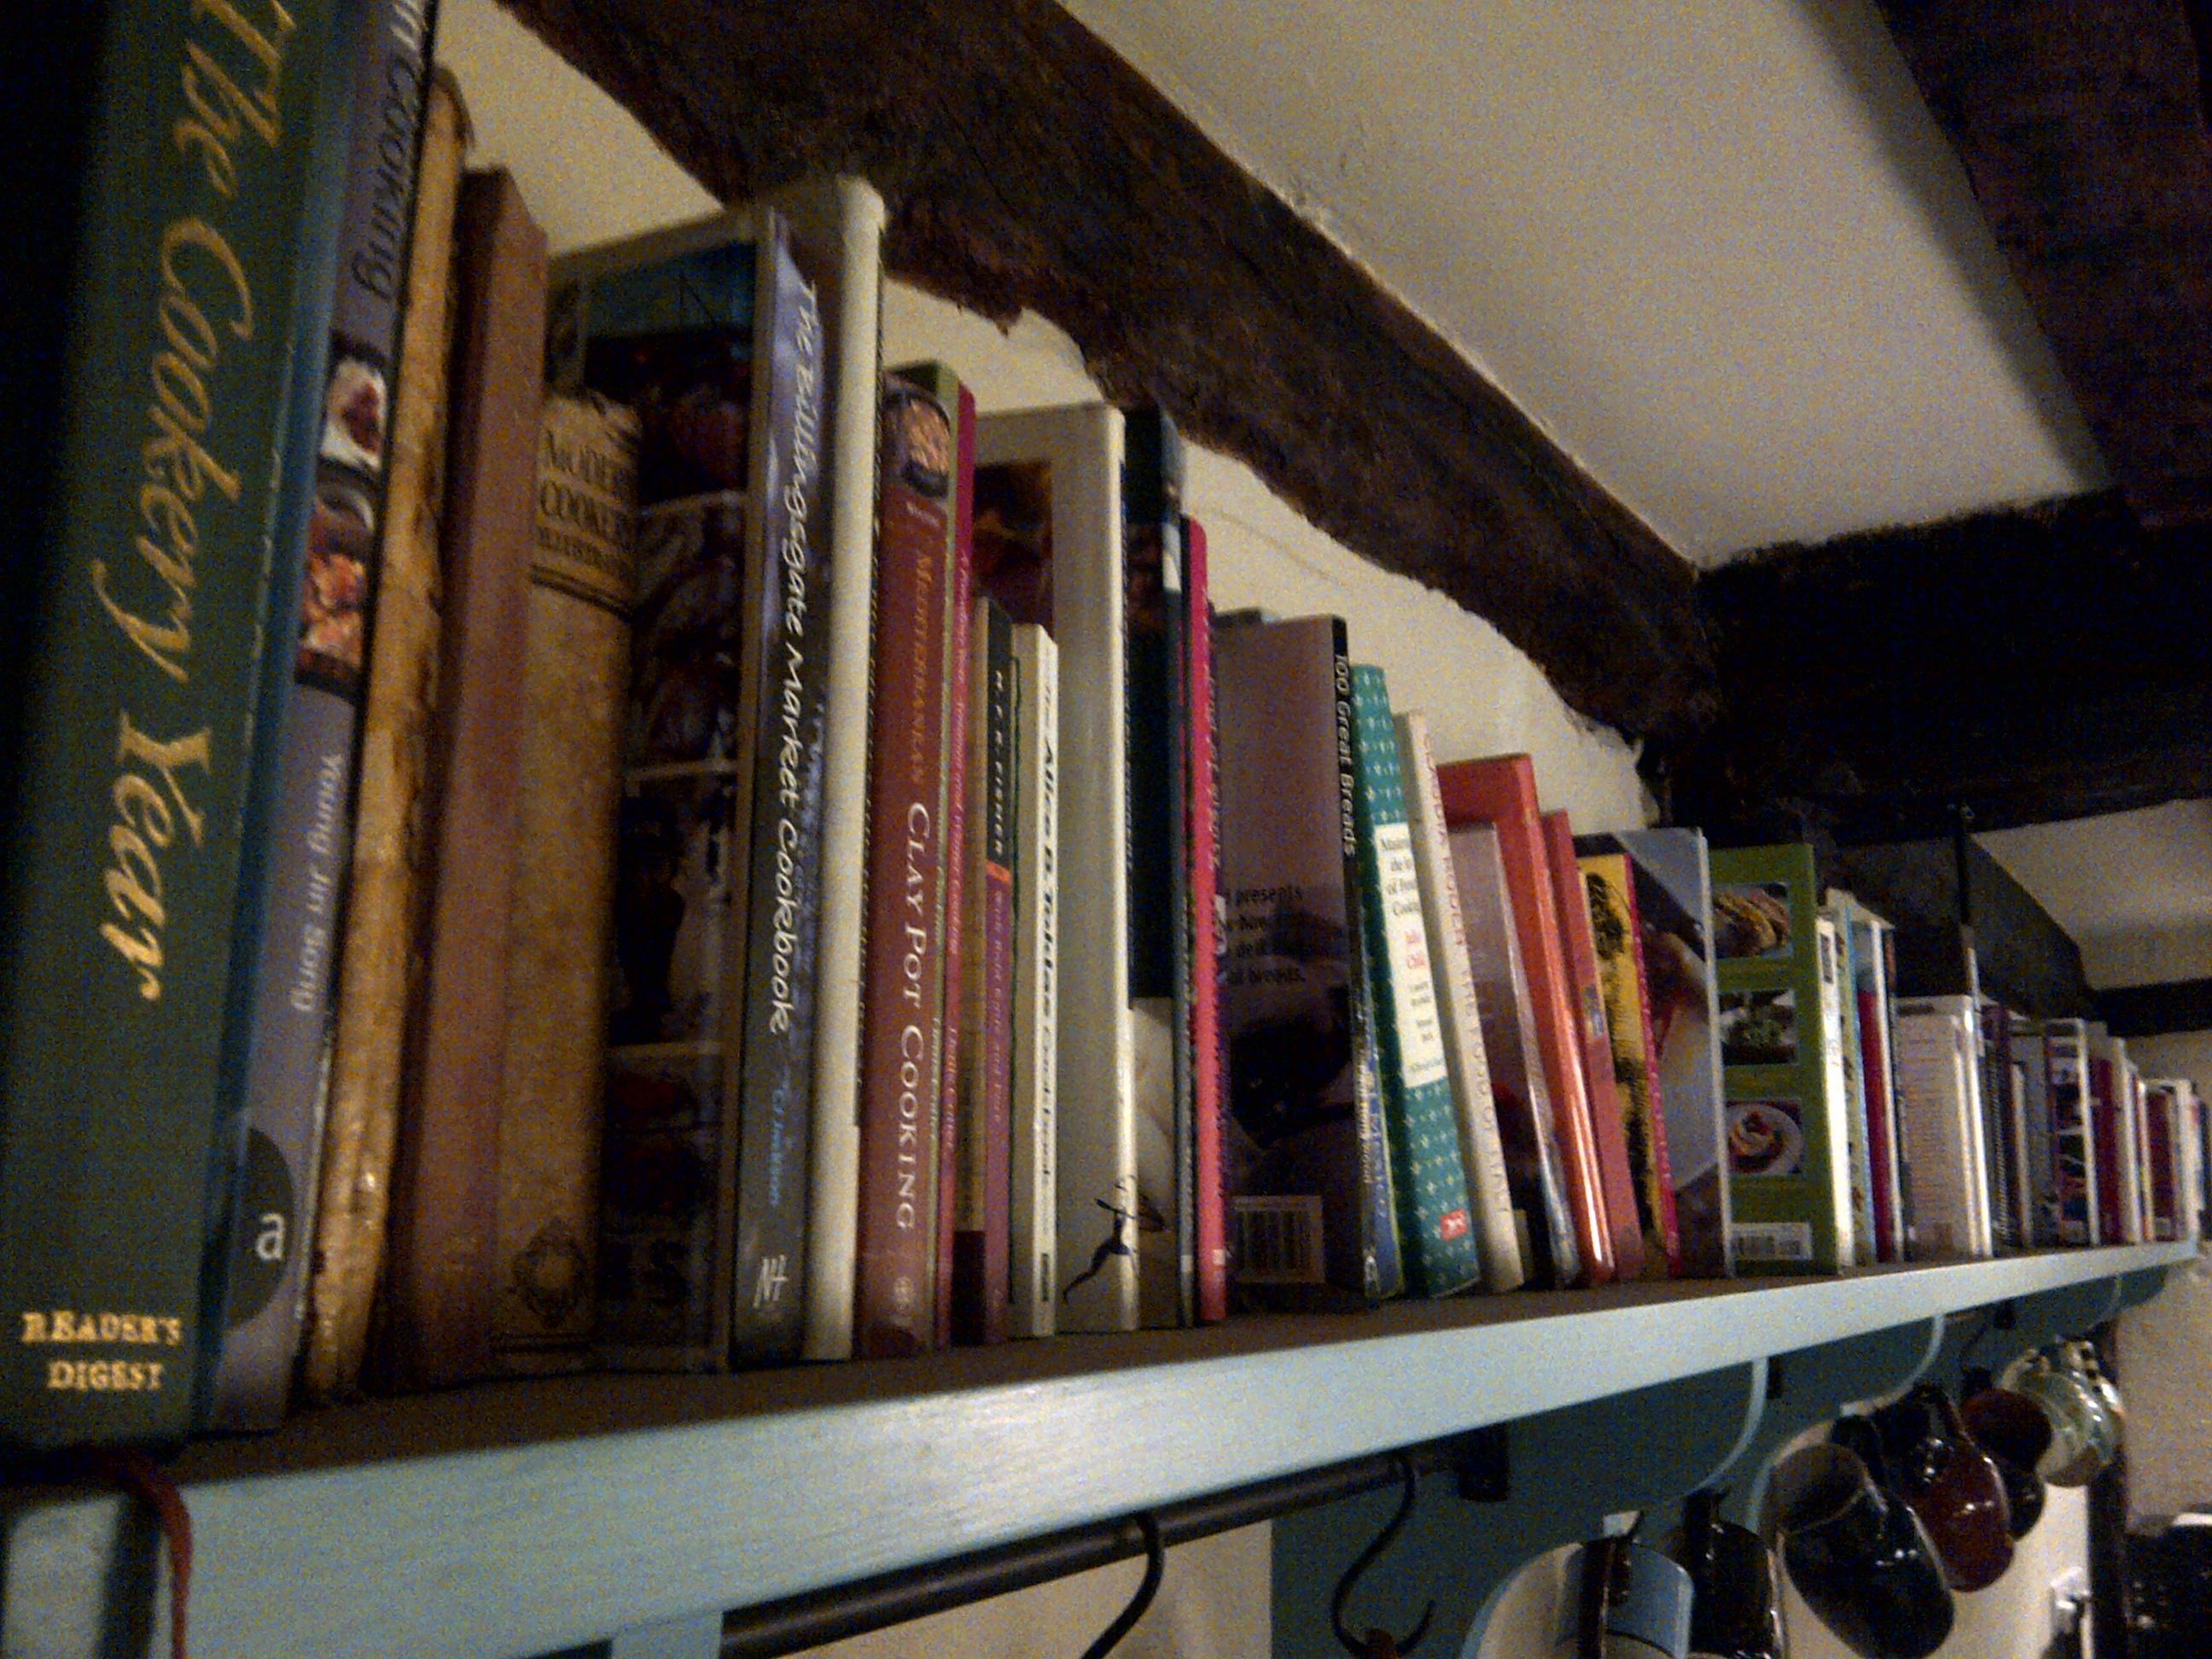 So Many Cookbooks, The Shelf Fell Off The Wall …